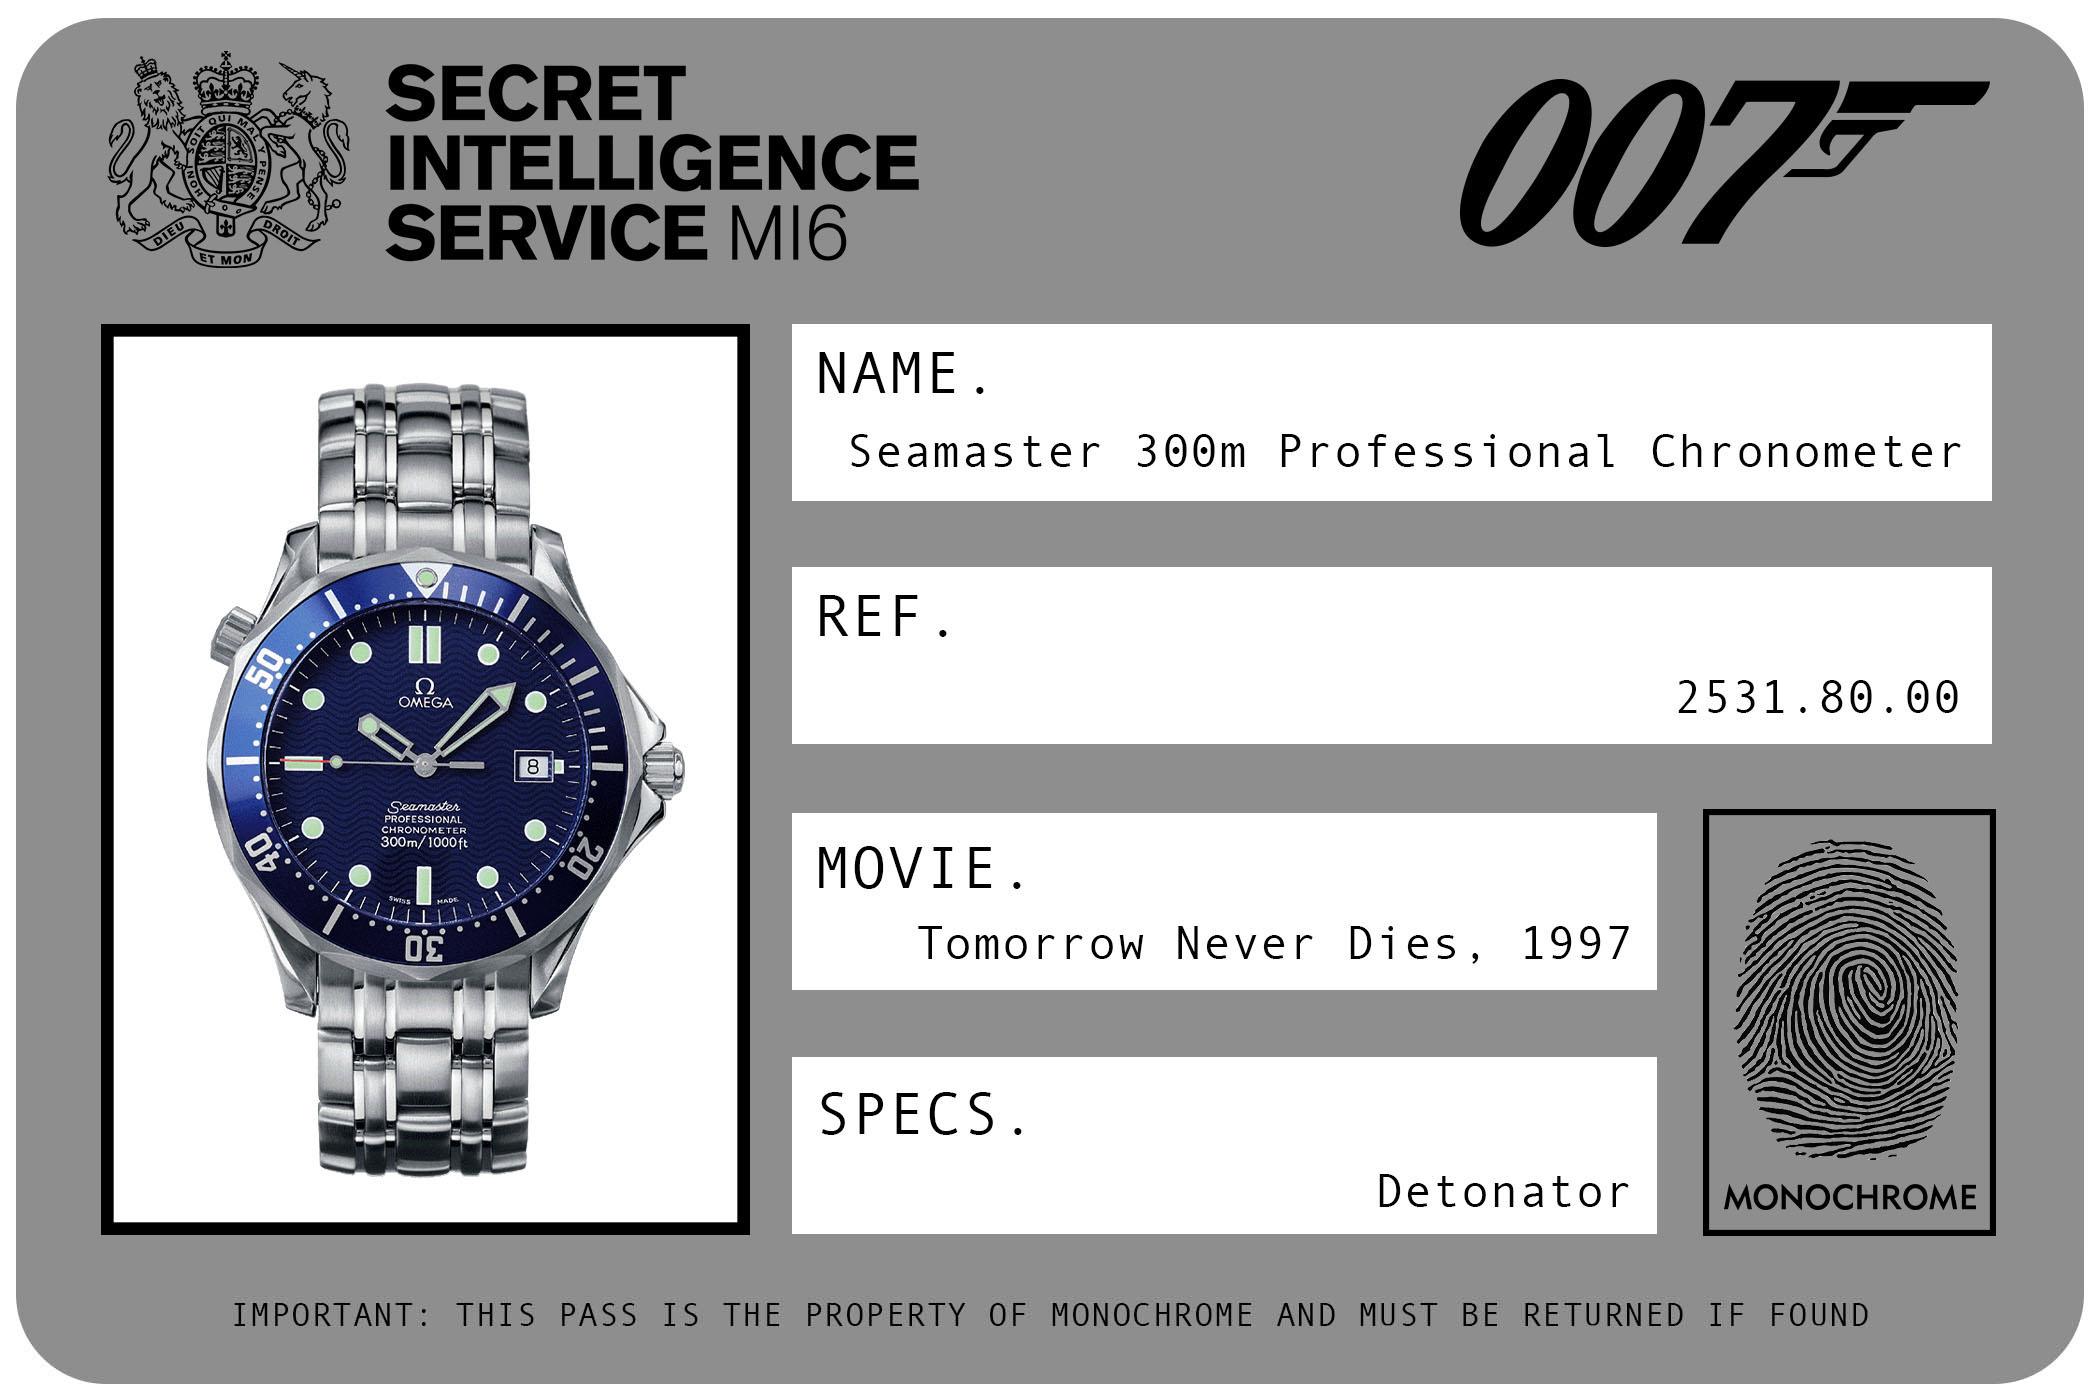 Omega Seamaster 300m Professional Chronometer Automatic 2521.80.00 James Bond Tomorrow Never Dies ID Card 1997